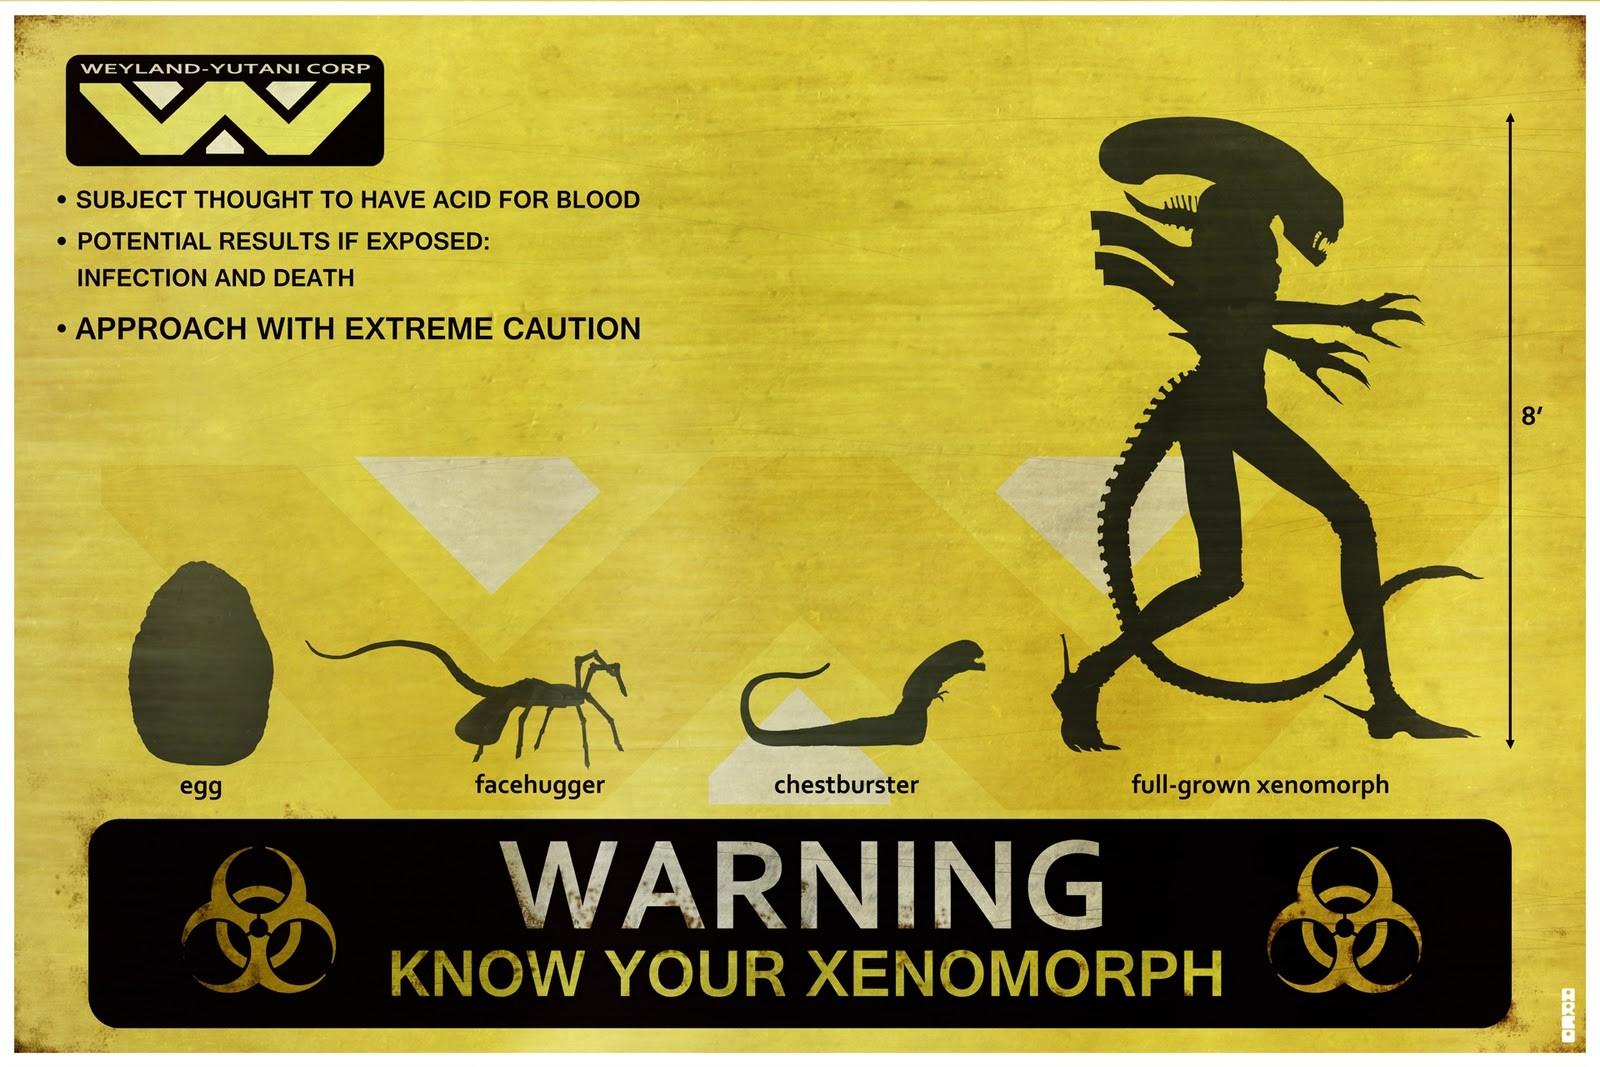 General 1600x1067 aliens signs Xenomorph artwork humor Alien (Creature) Eggs (Alien) facehugger Weyland-Yutani Corporation dark humor science fiction horror creature Biohazard (Sign) Chest Burster (Alien)